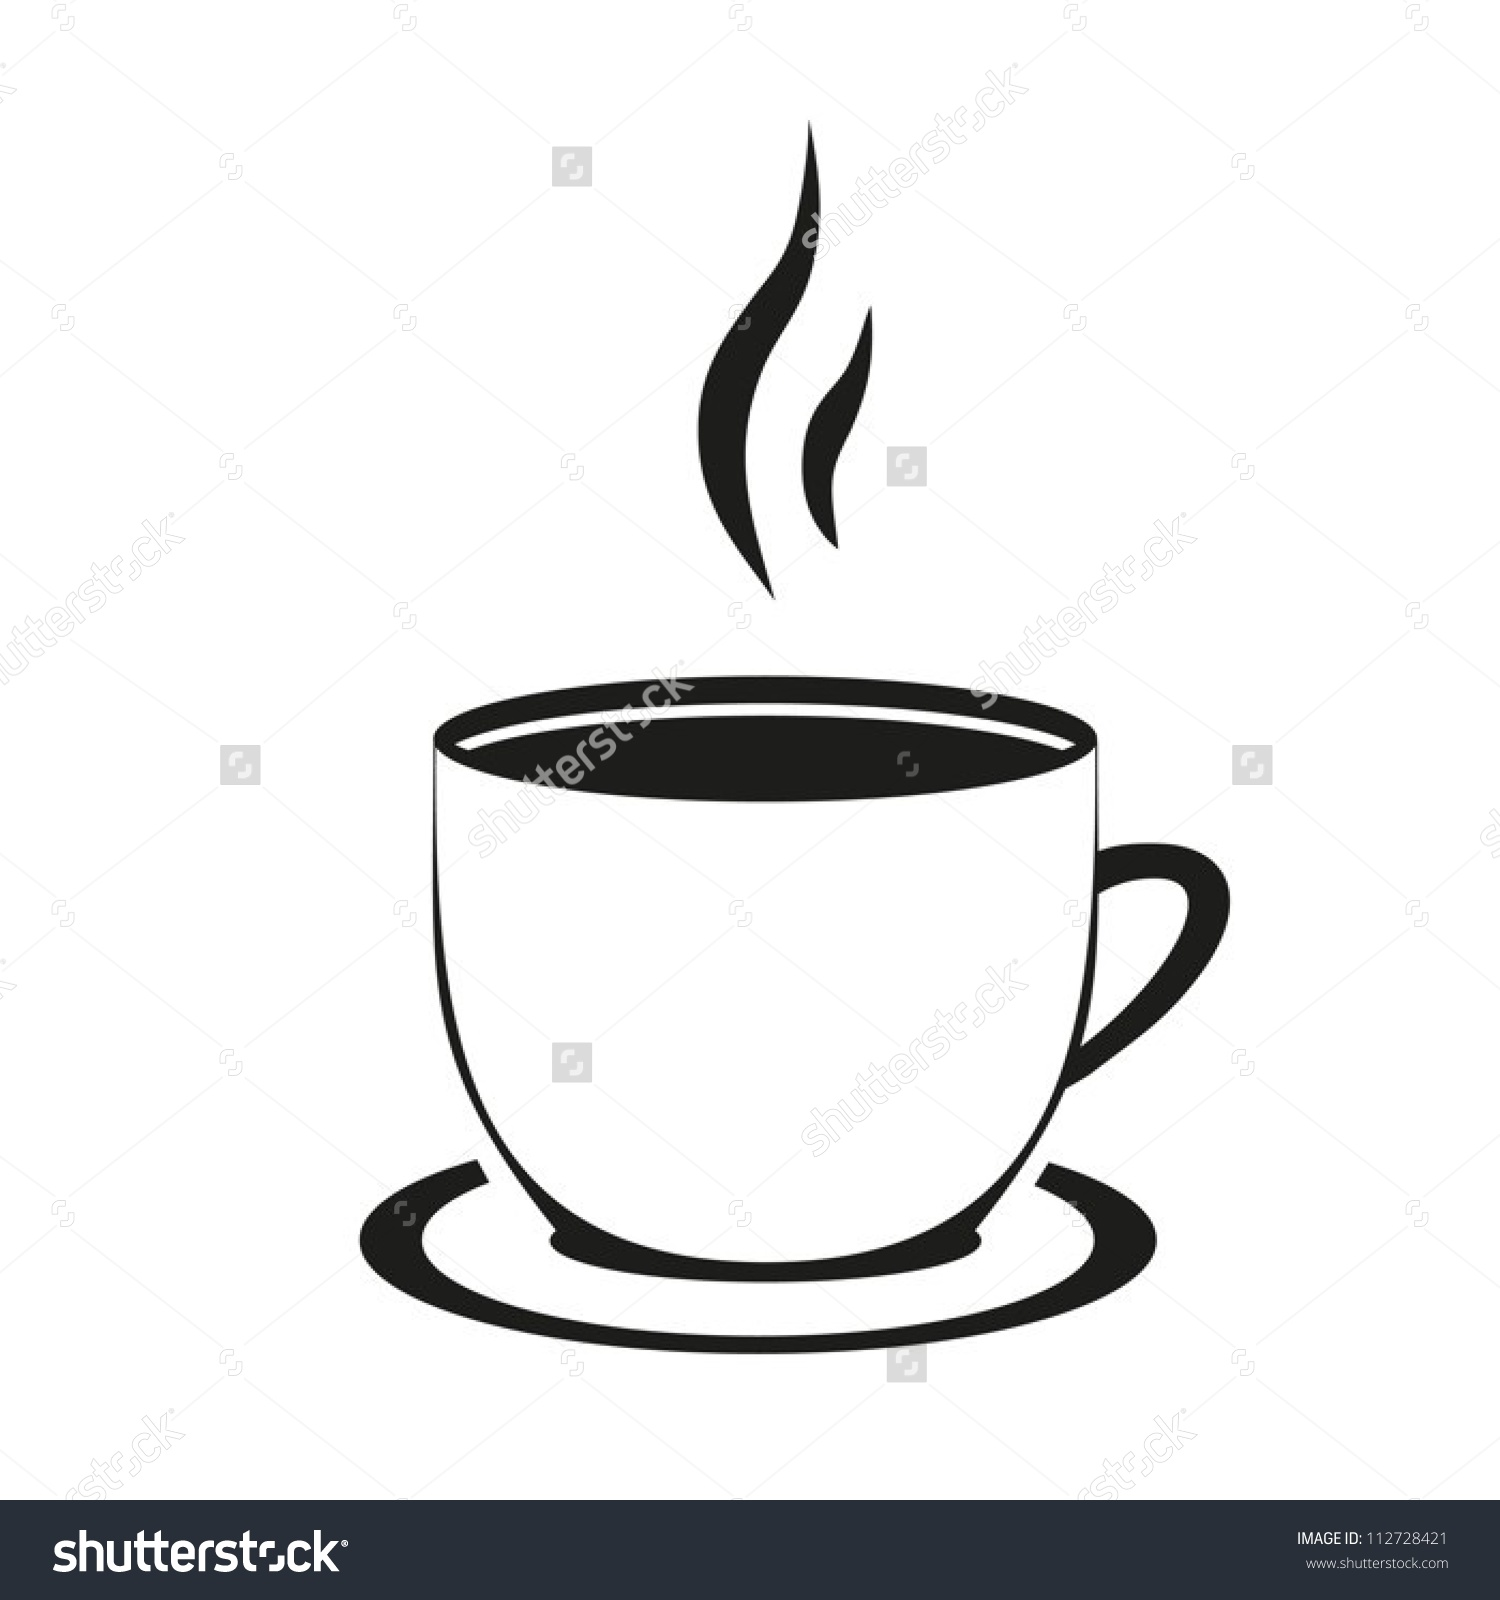 Teapot clipart hot Cup tea Coffee Art Hot